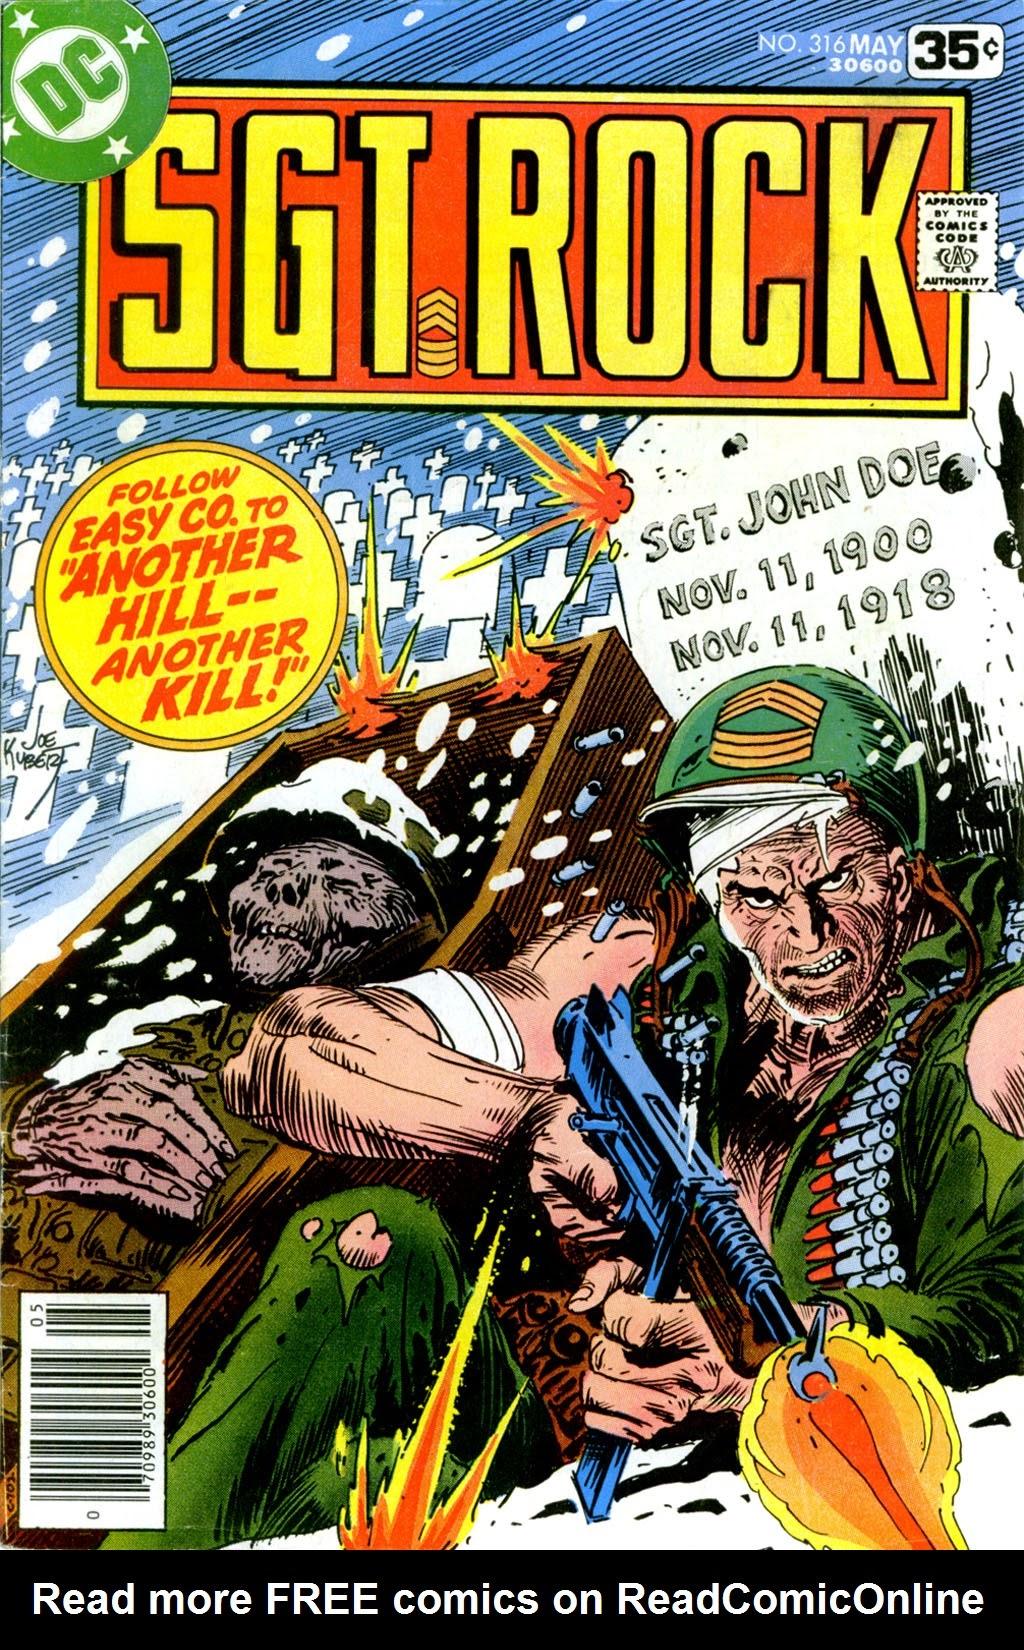 Read online Sgt. Rock comic -  Issue #316 - 1